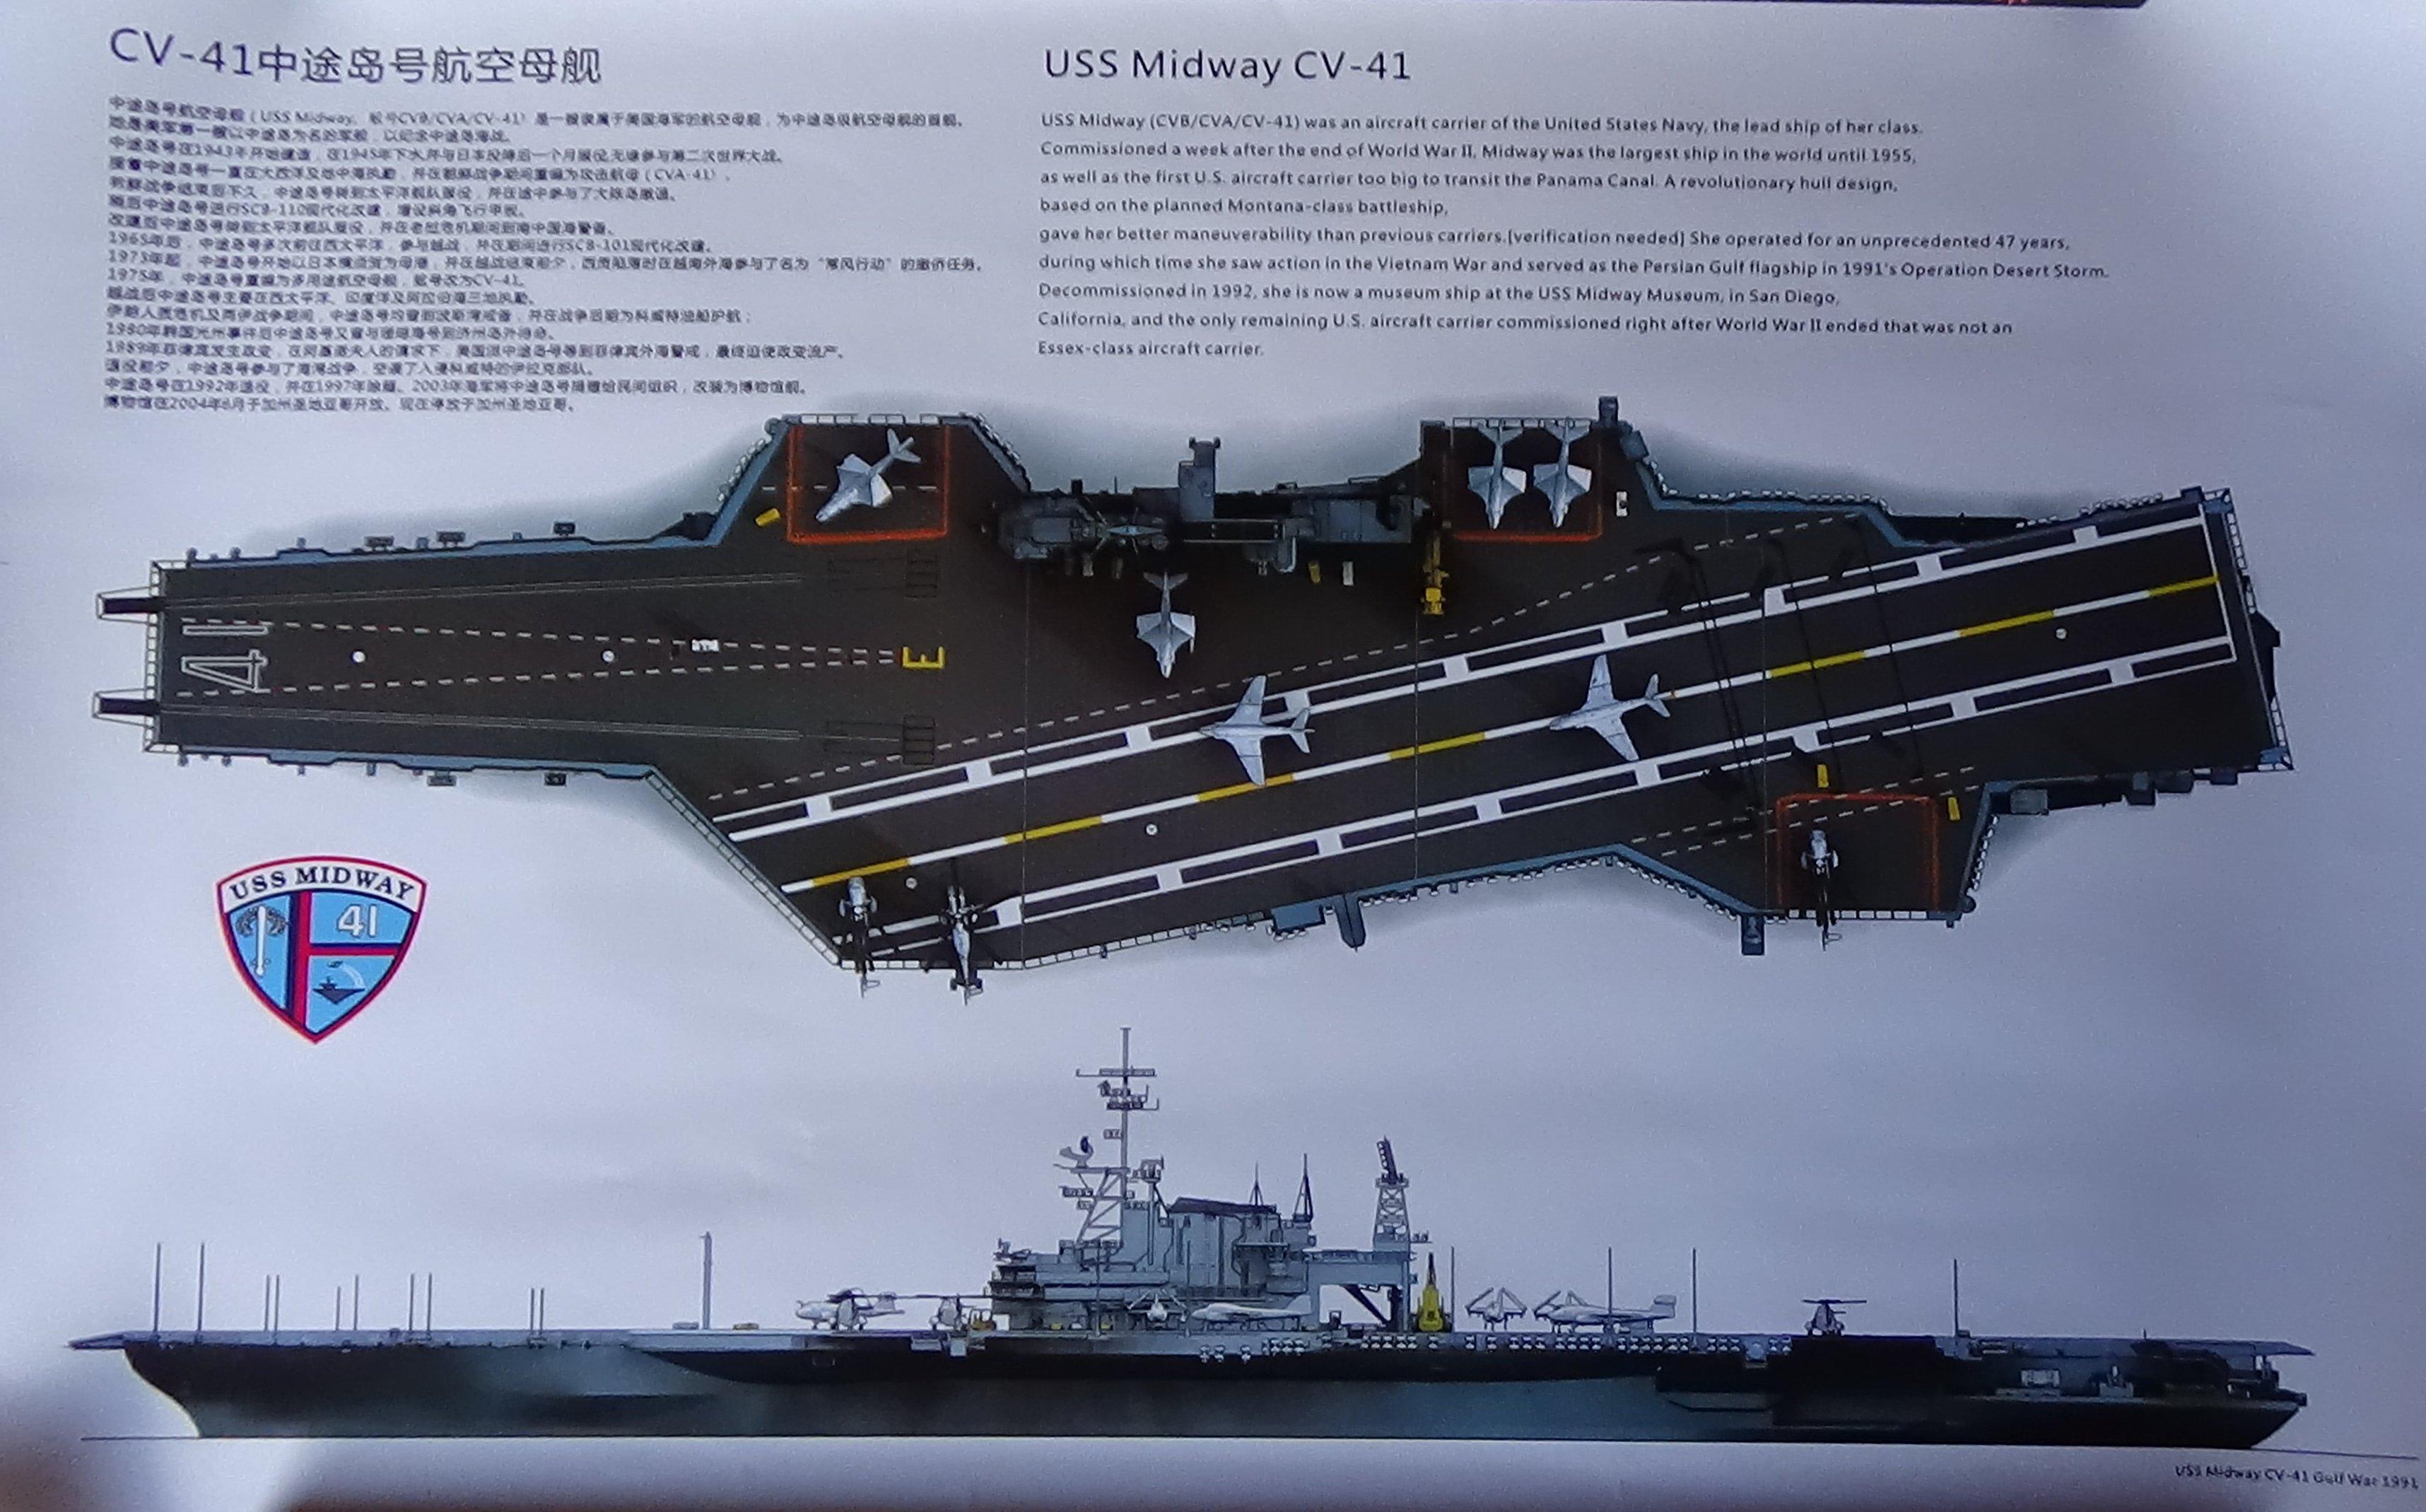 [USS Midway CVA-41] Porte avions lourd américain-700e-Orange Hobby 17071905075023134915156019